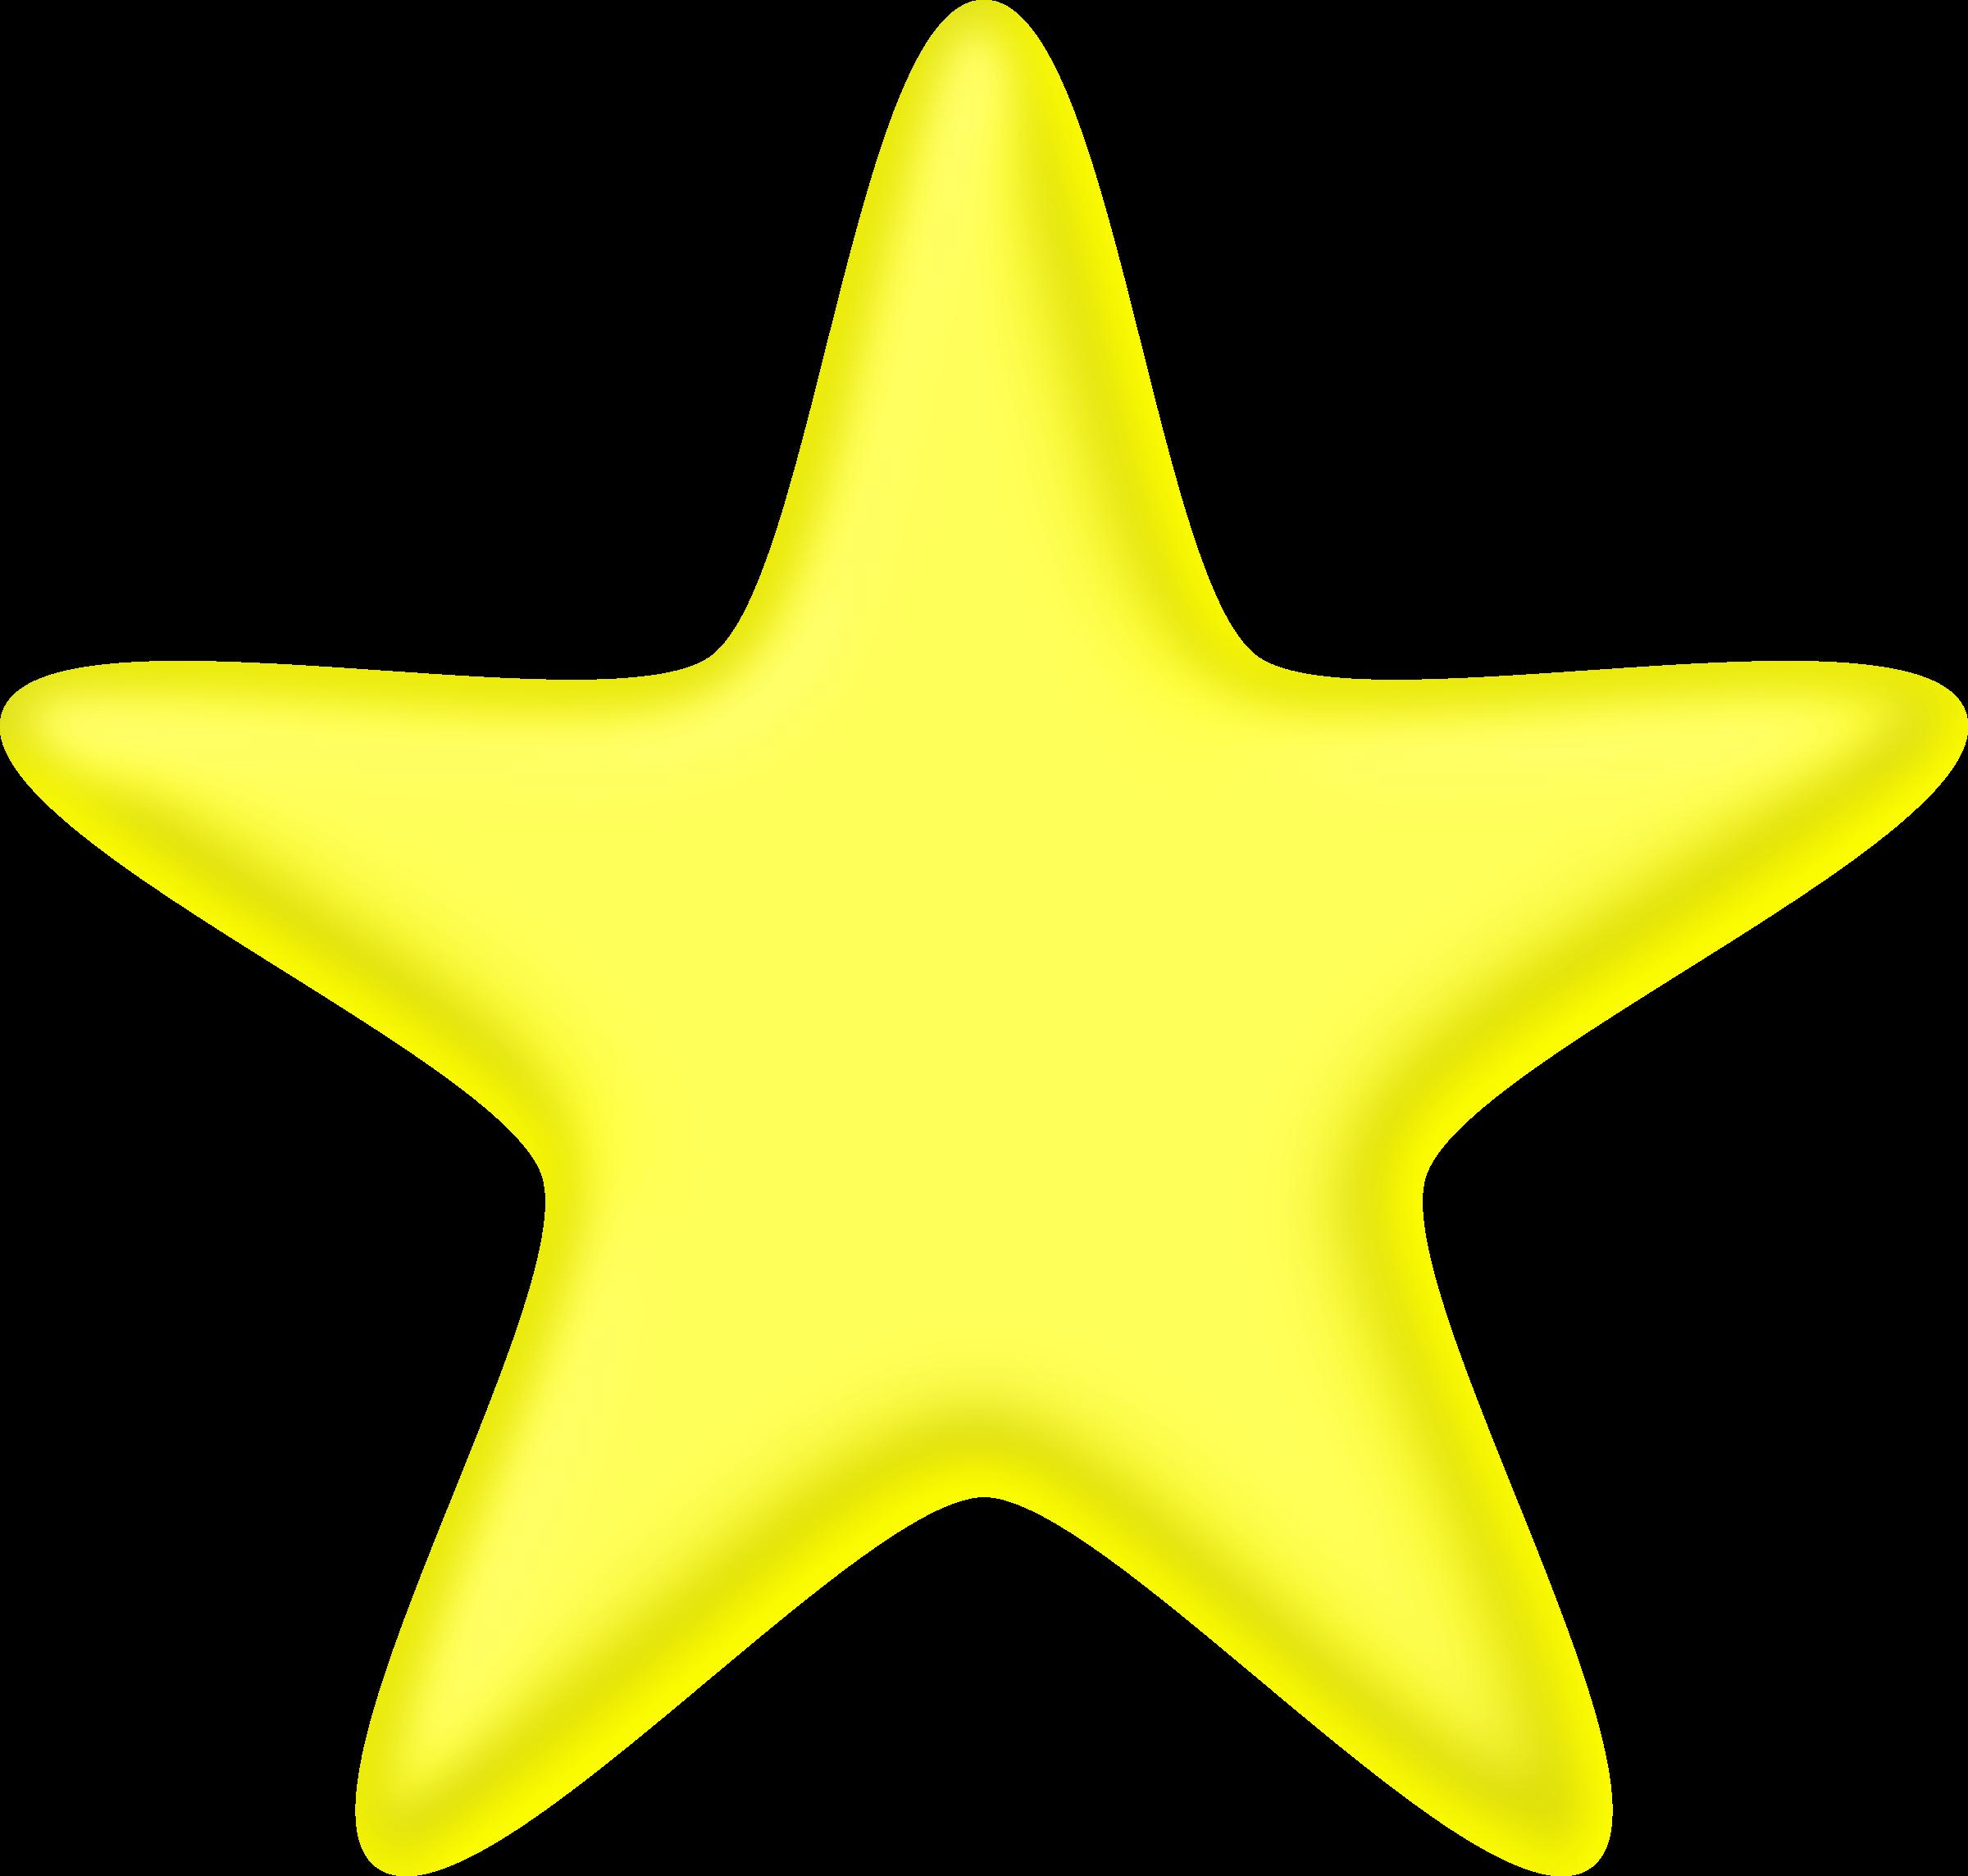 3d star clipart svg free download Clipart - 3D yellow star svg free download